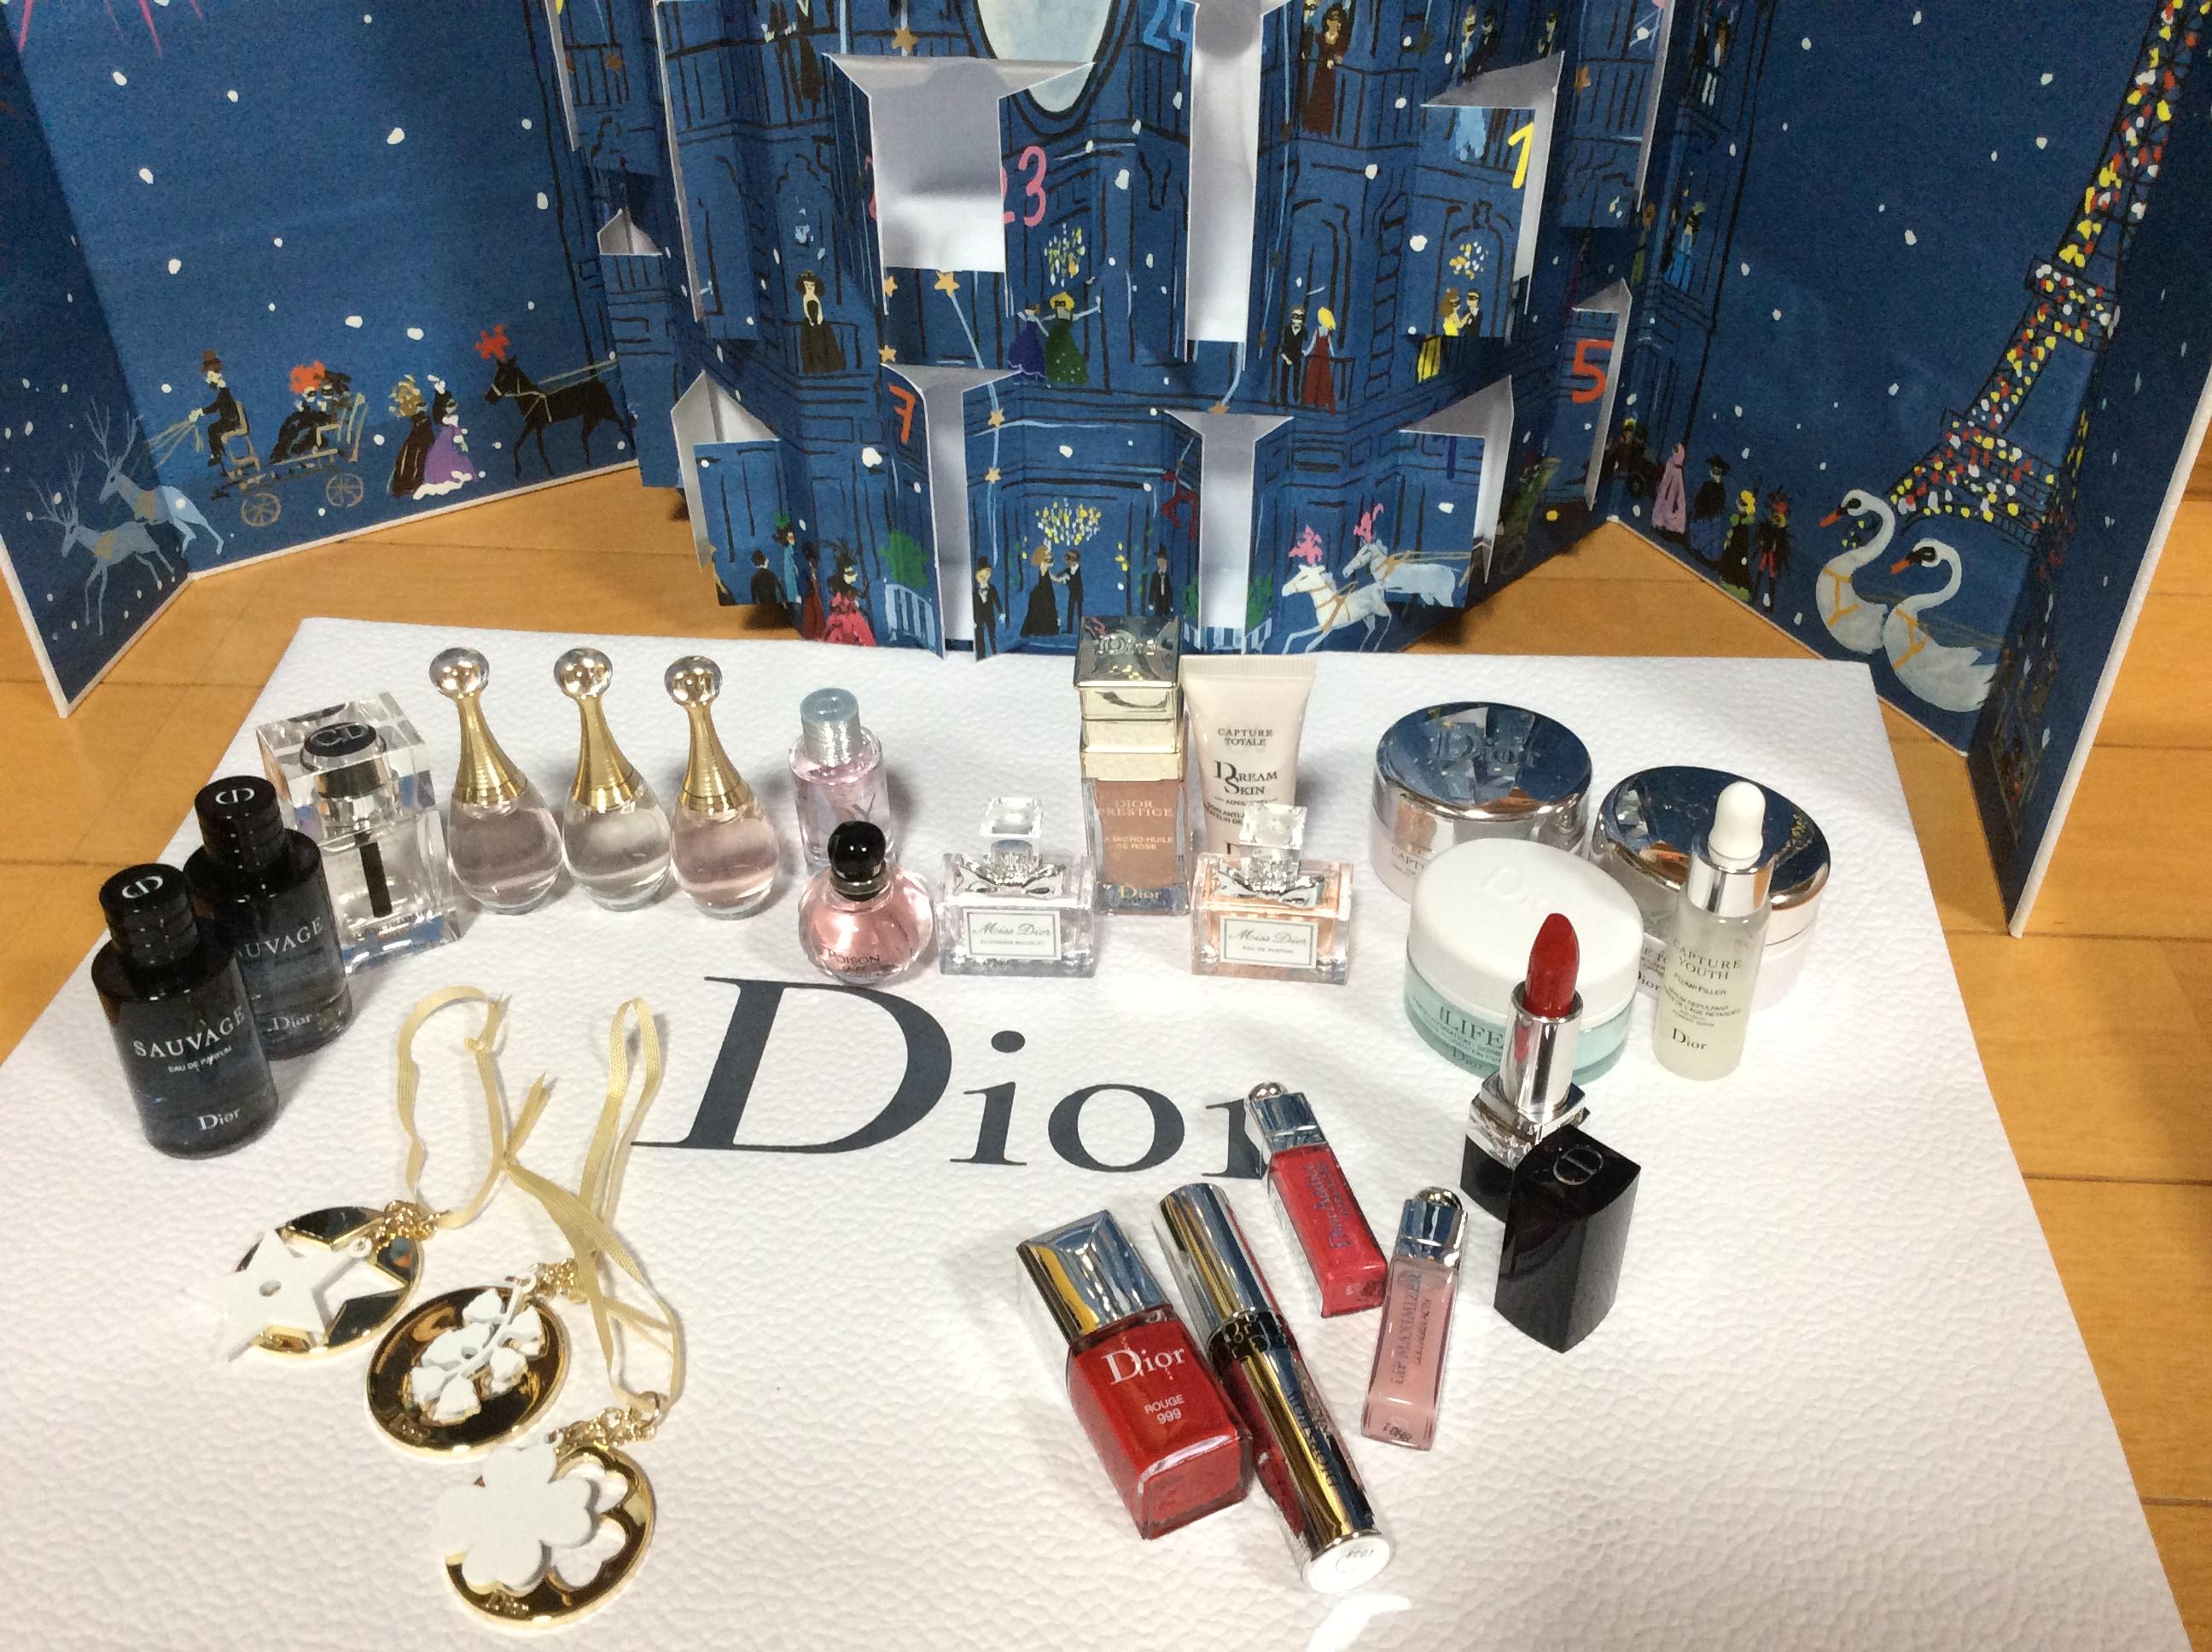 Dior ディオール アドベントカレンダー 2018 中身